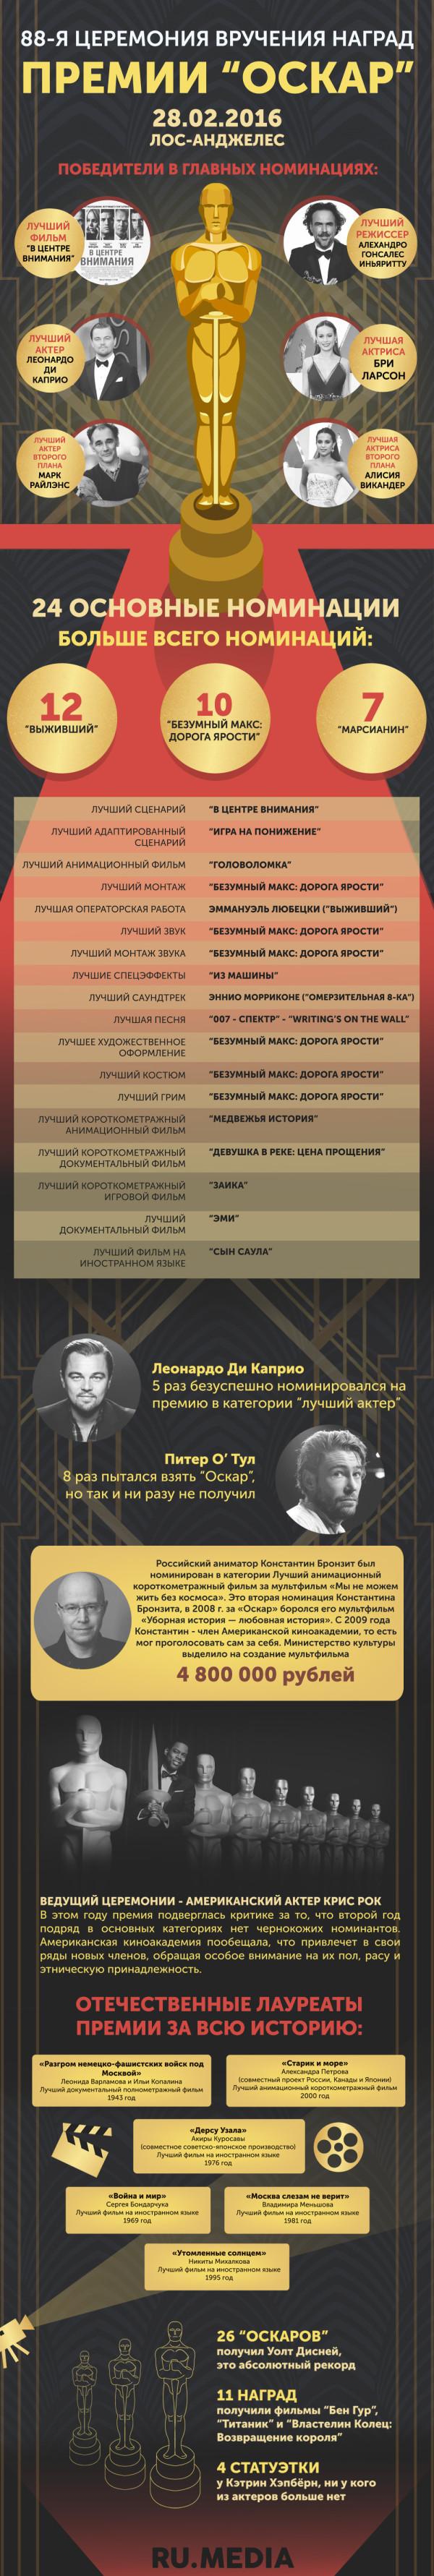 "Результаты ""Оскара 2016"". Фото: www.dni.ru"